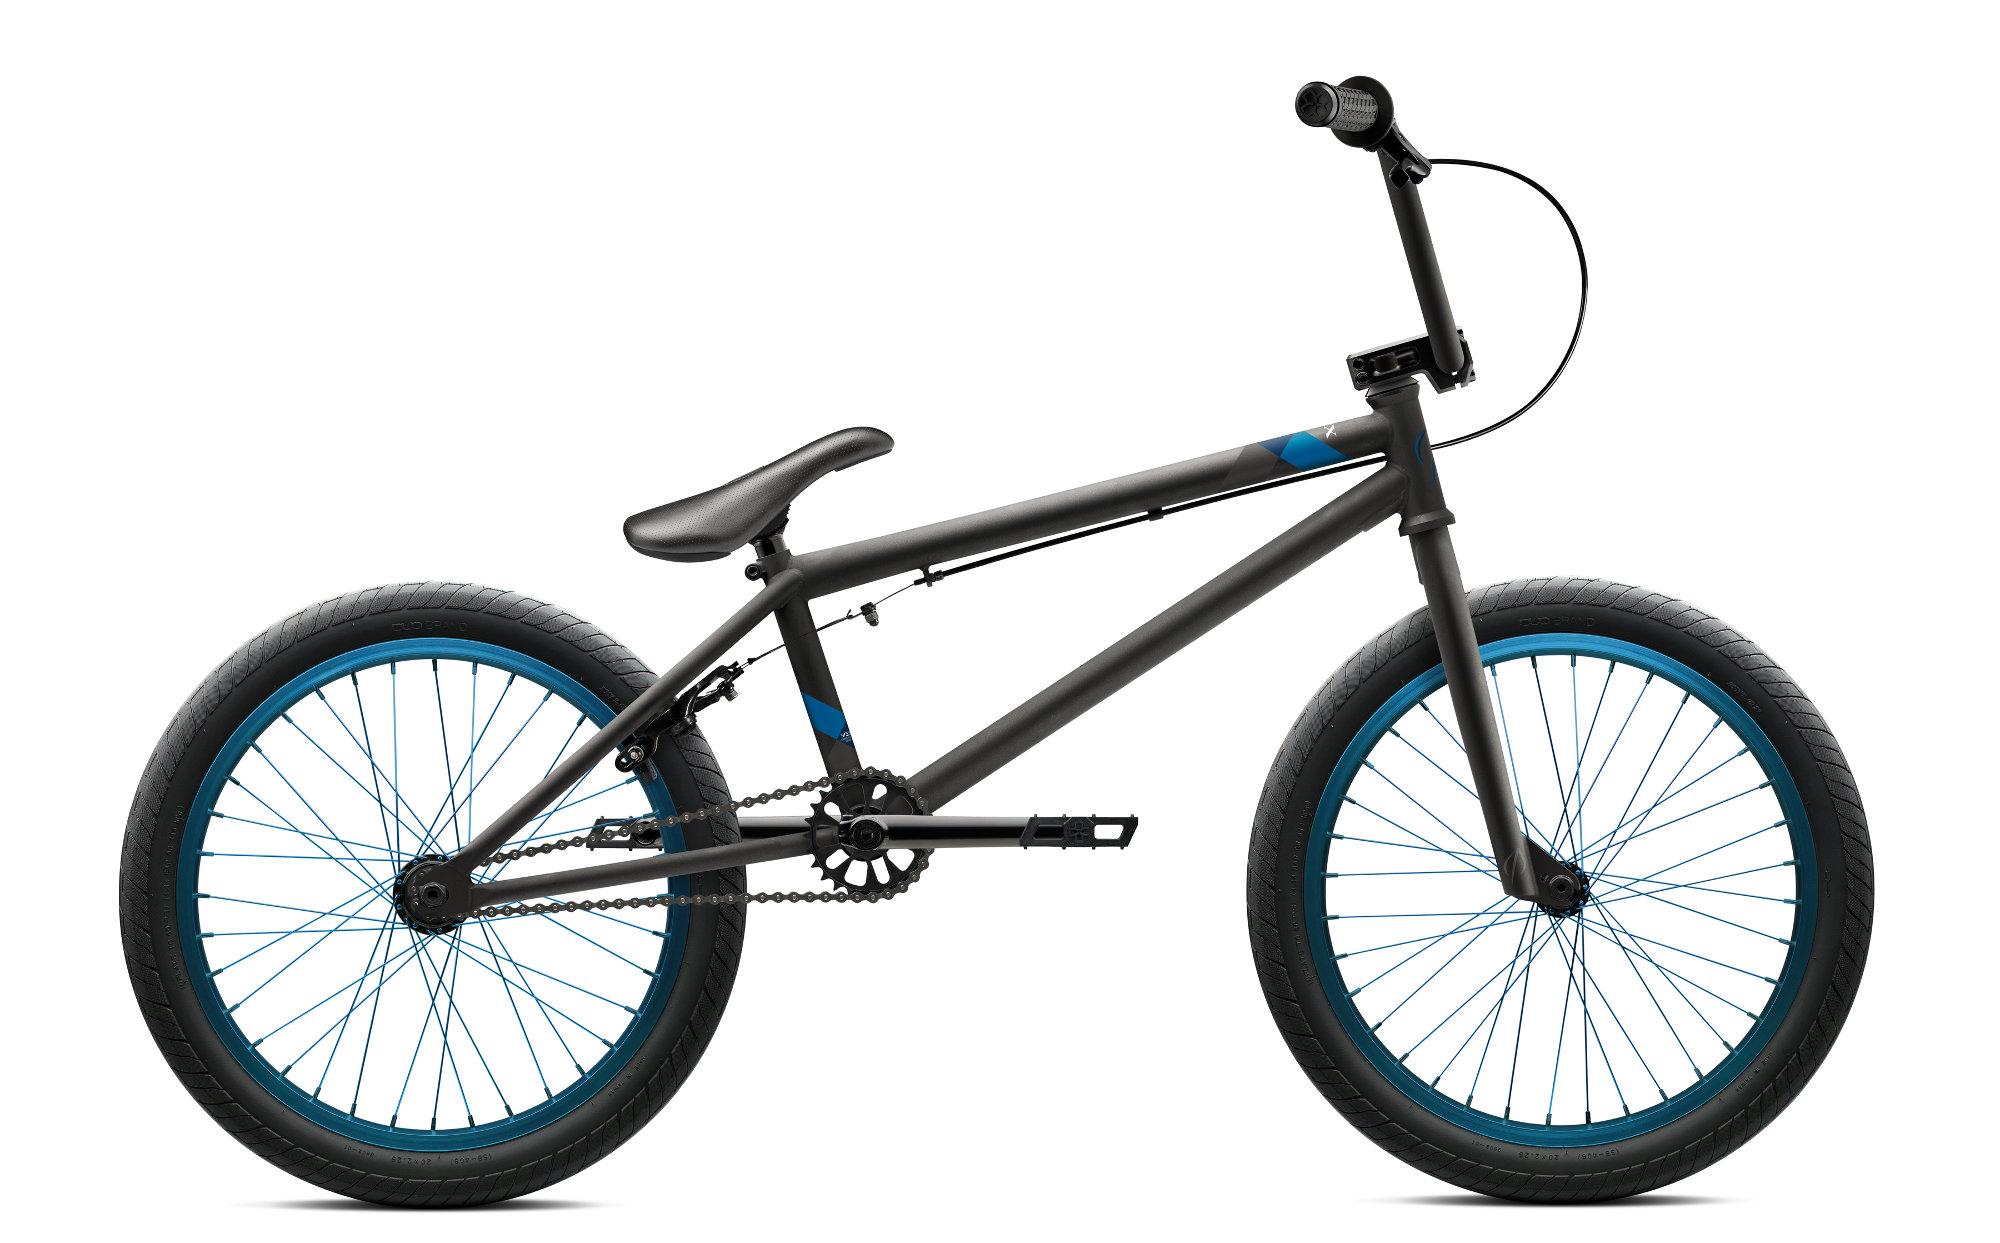 Rower Verde Vex 2012 Black / Blue : Sklep AveBmx - rowery, części i ...